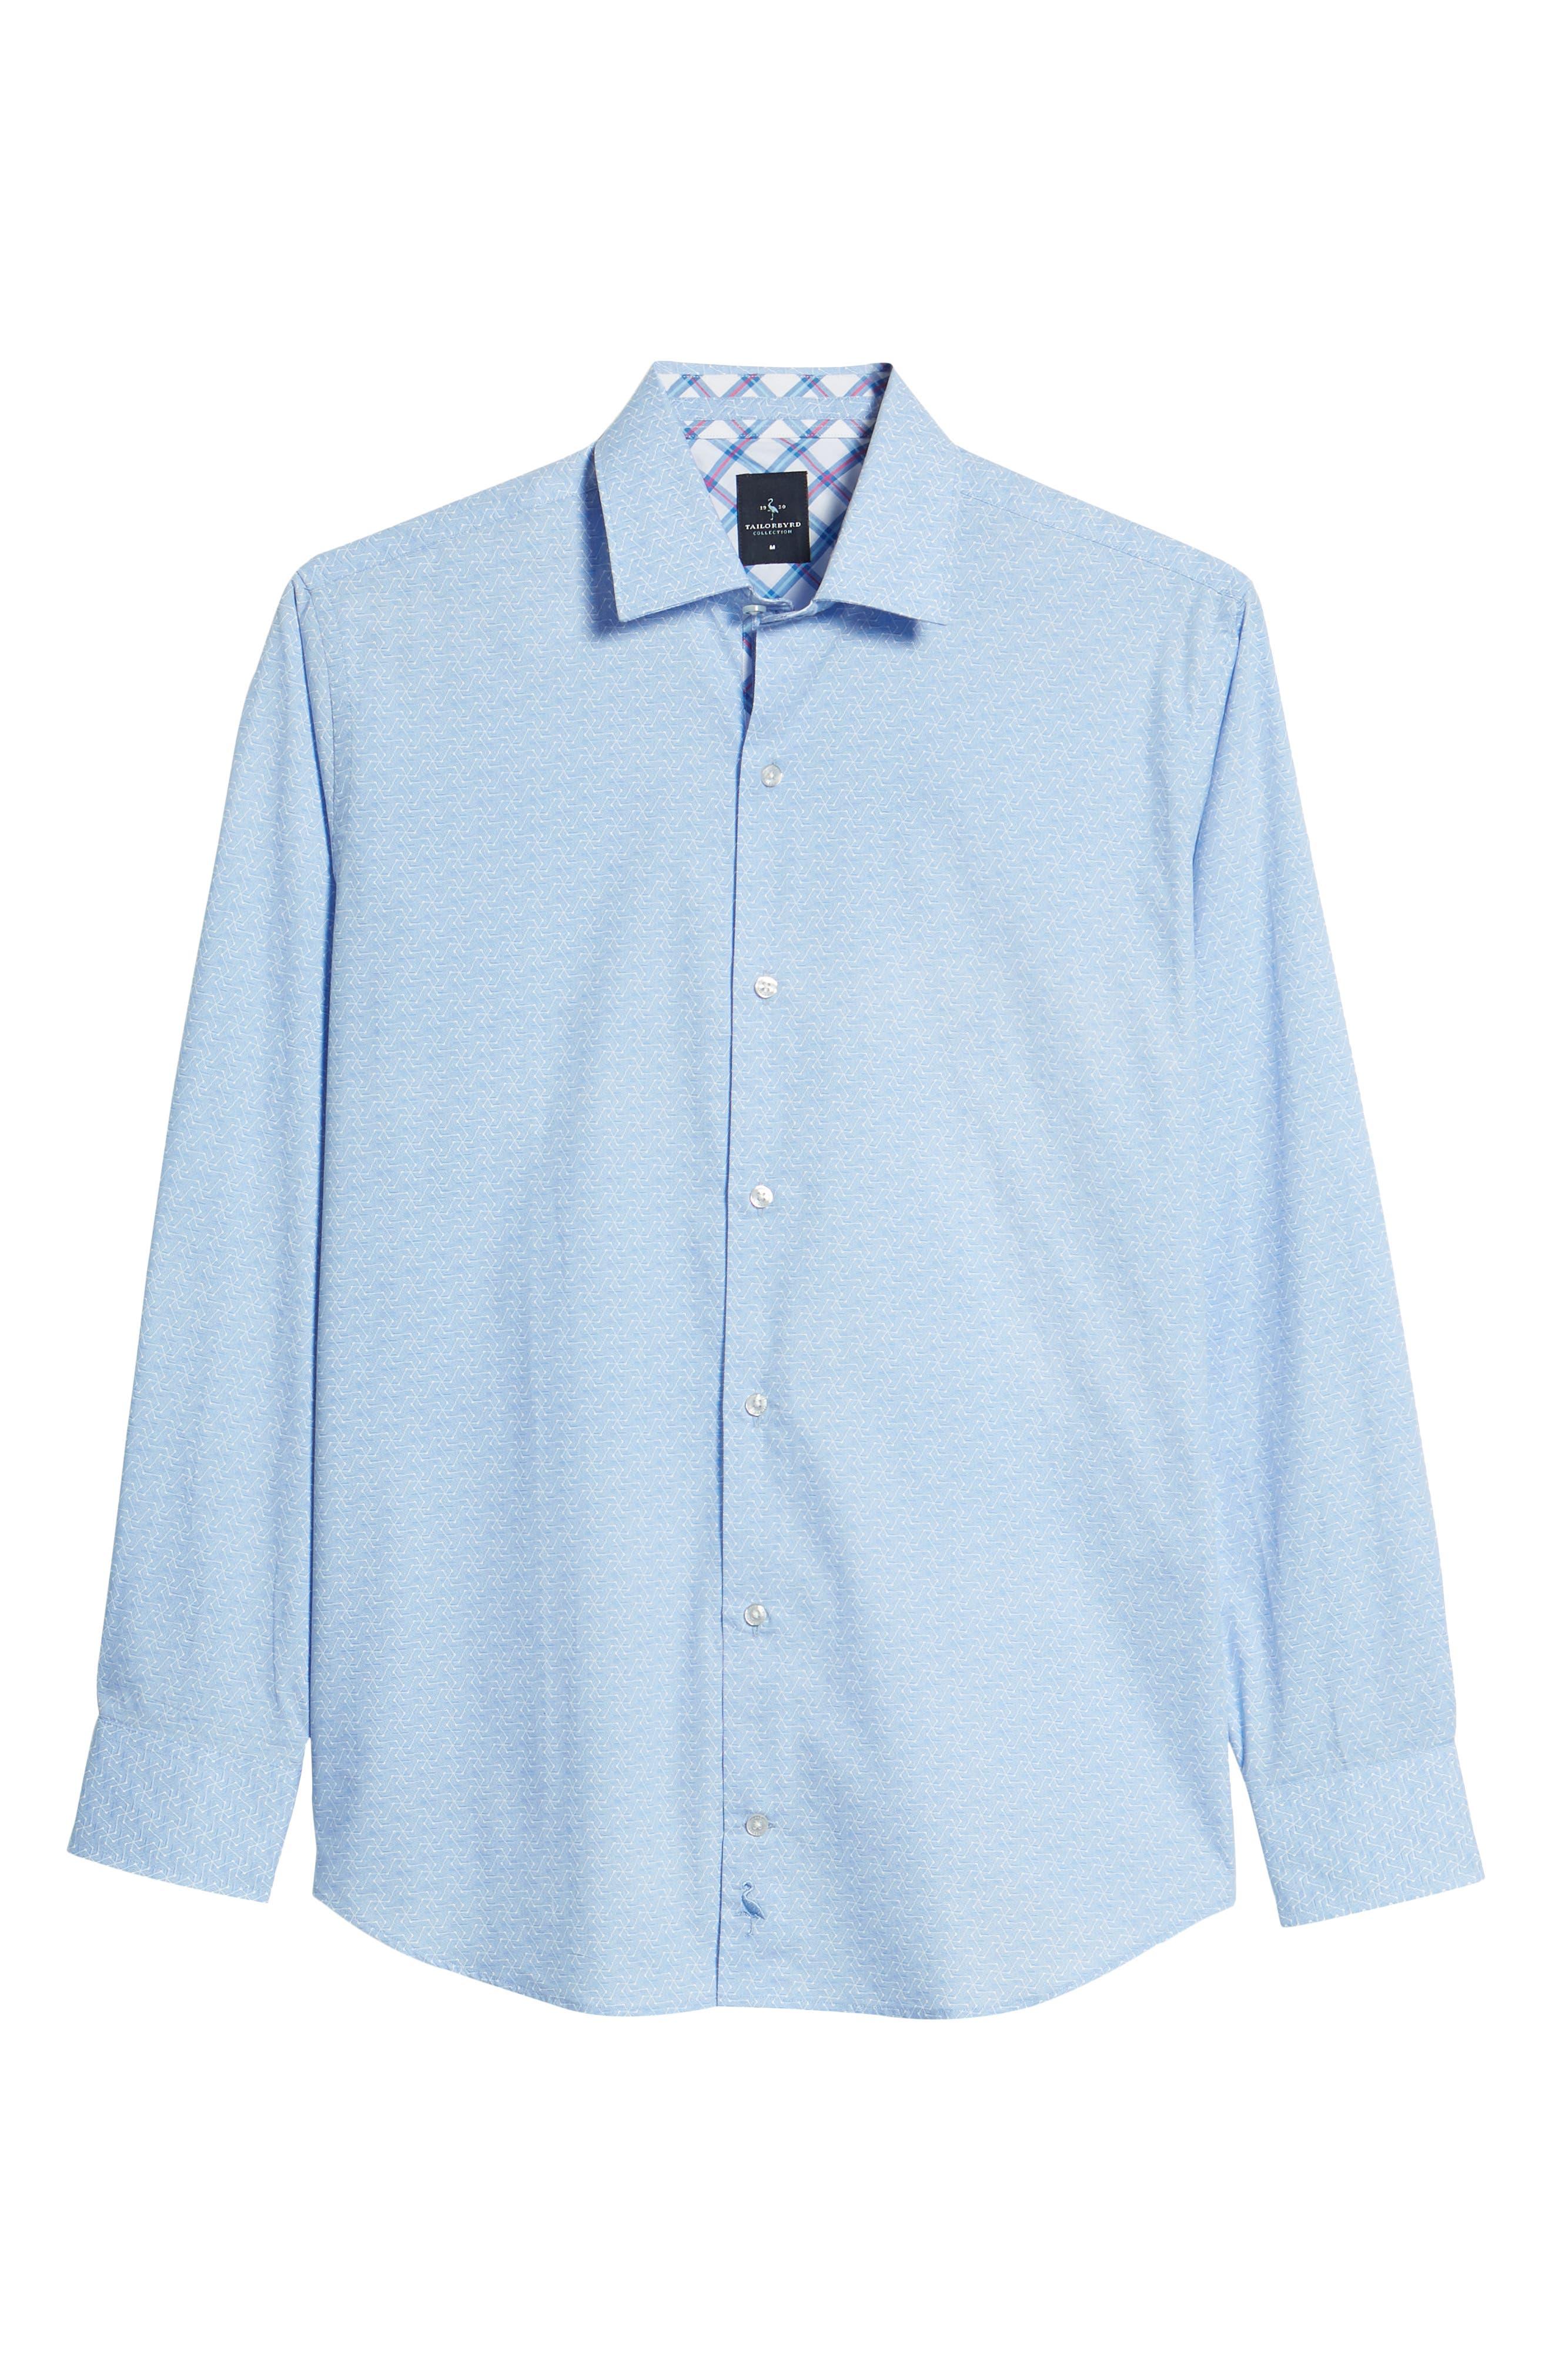 Beckham Regular Fit Plaid Sport Shirt,                             Alternate thumbnail 6, color,                             450